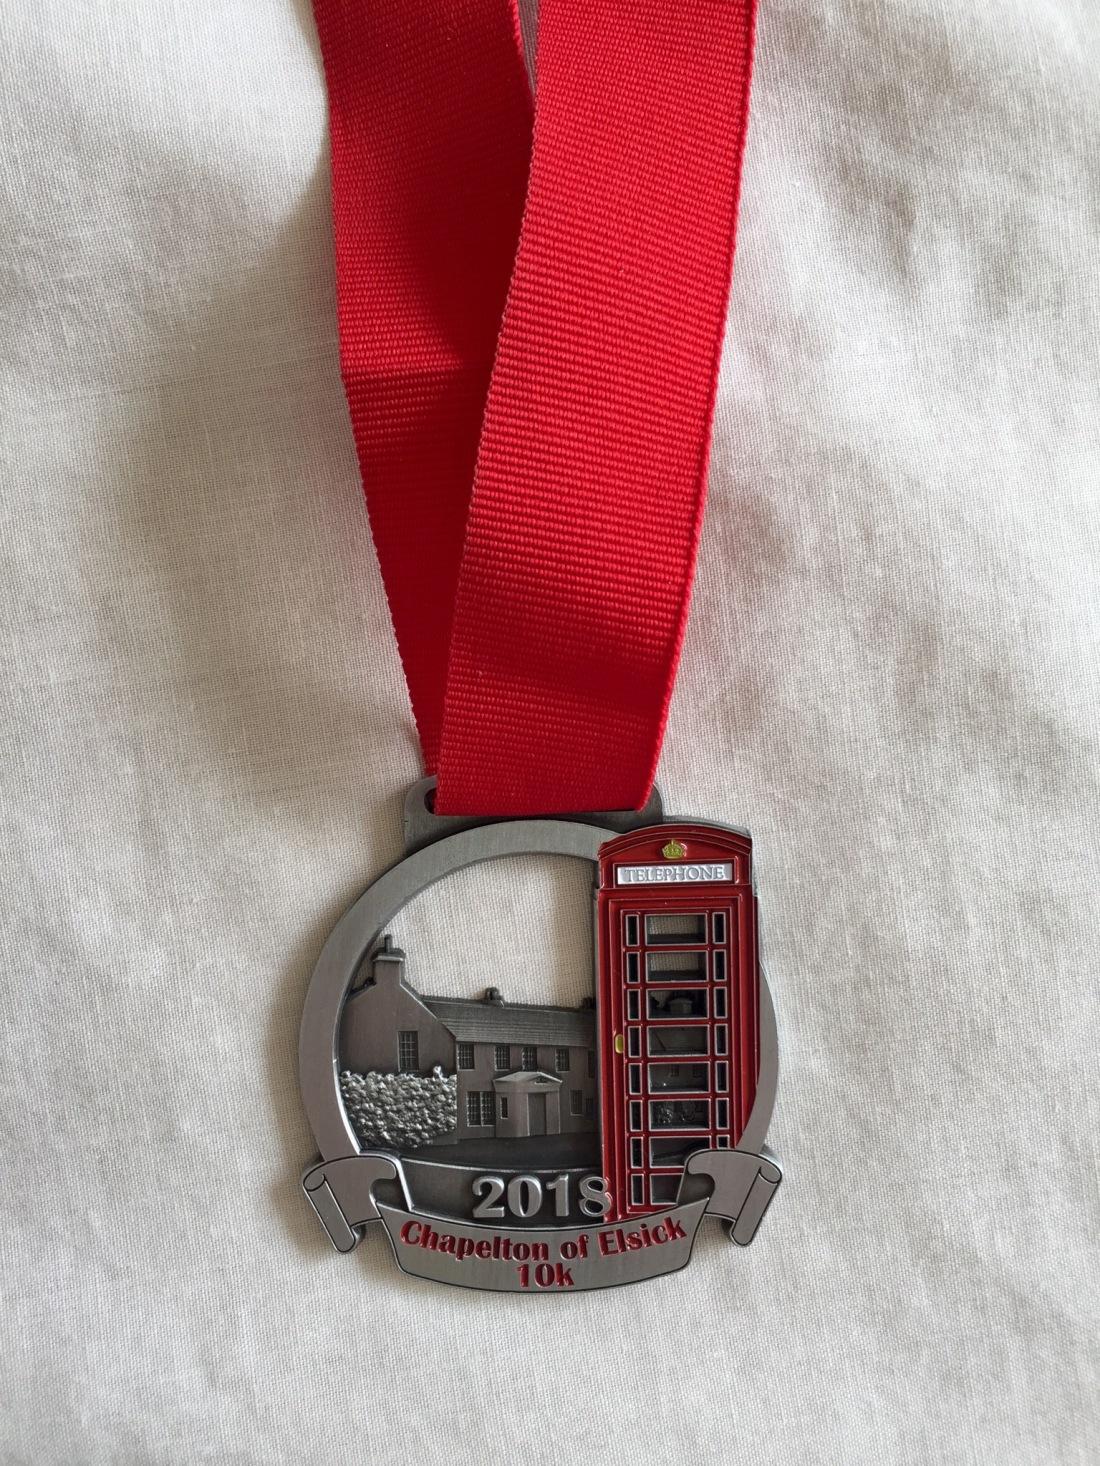 Chapelton of Elsick 10k Medal